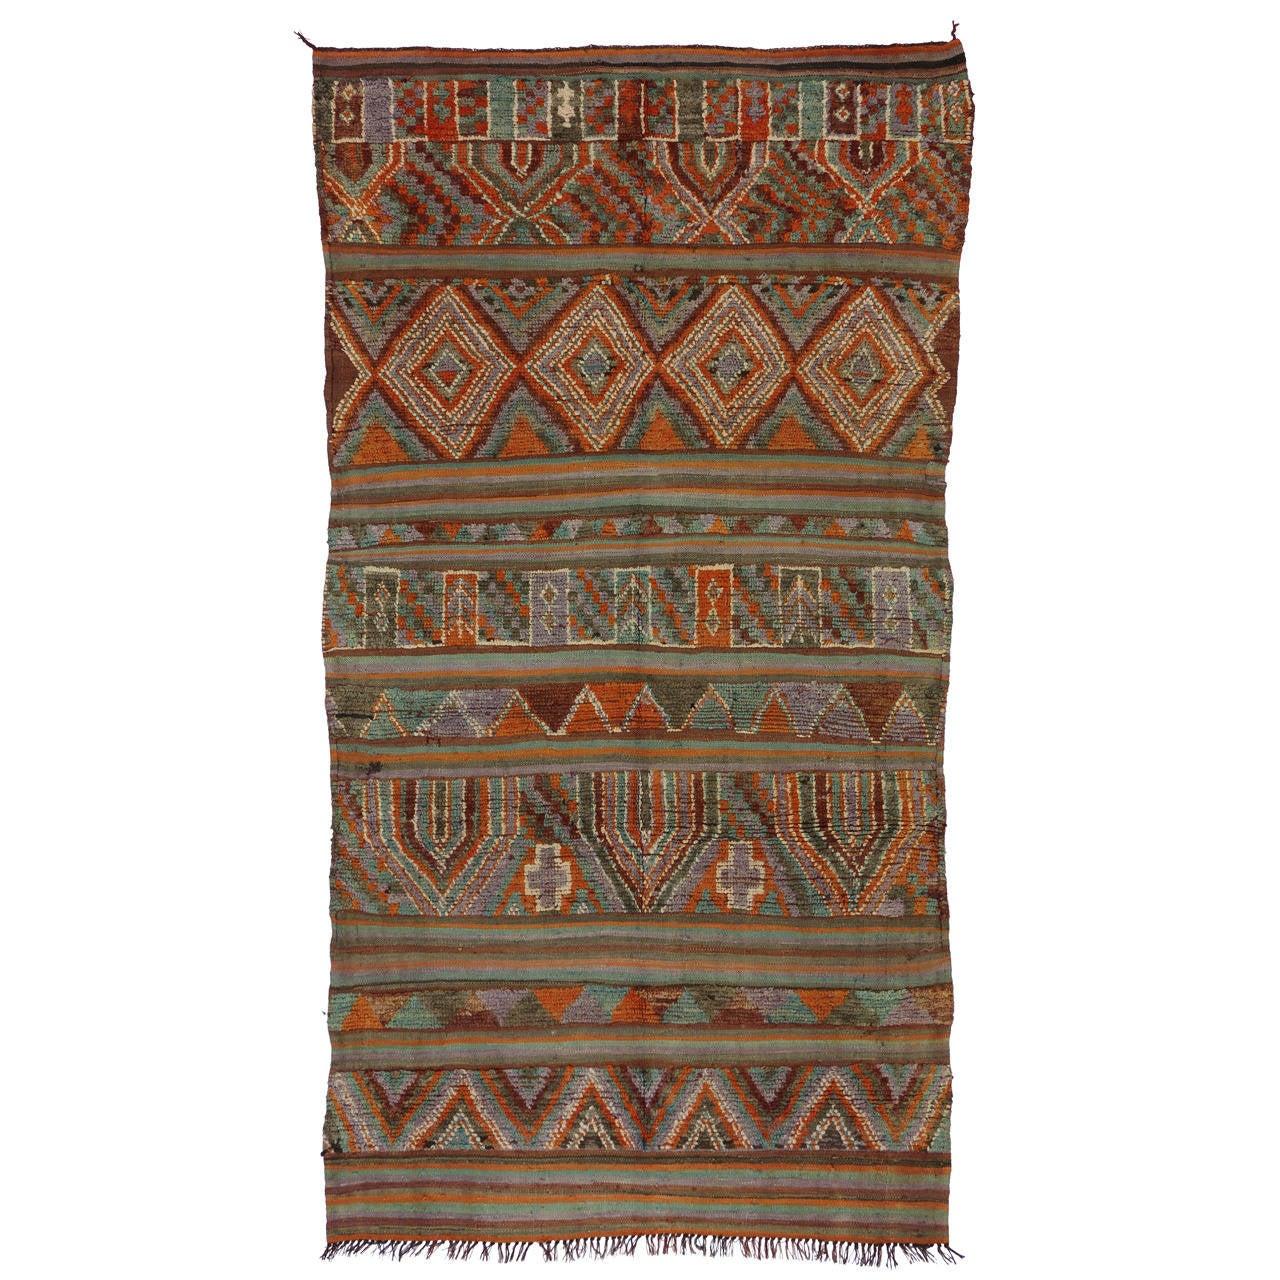 Vintage Moroccan Kilim And Pile Rug At 1stdibs